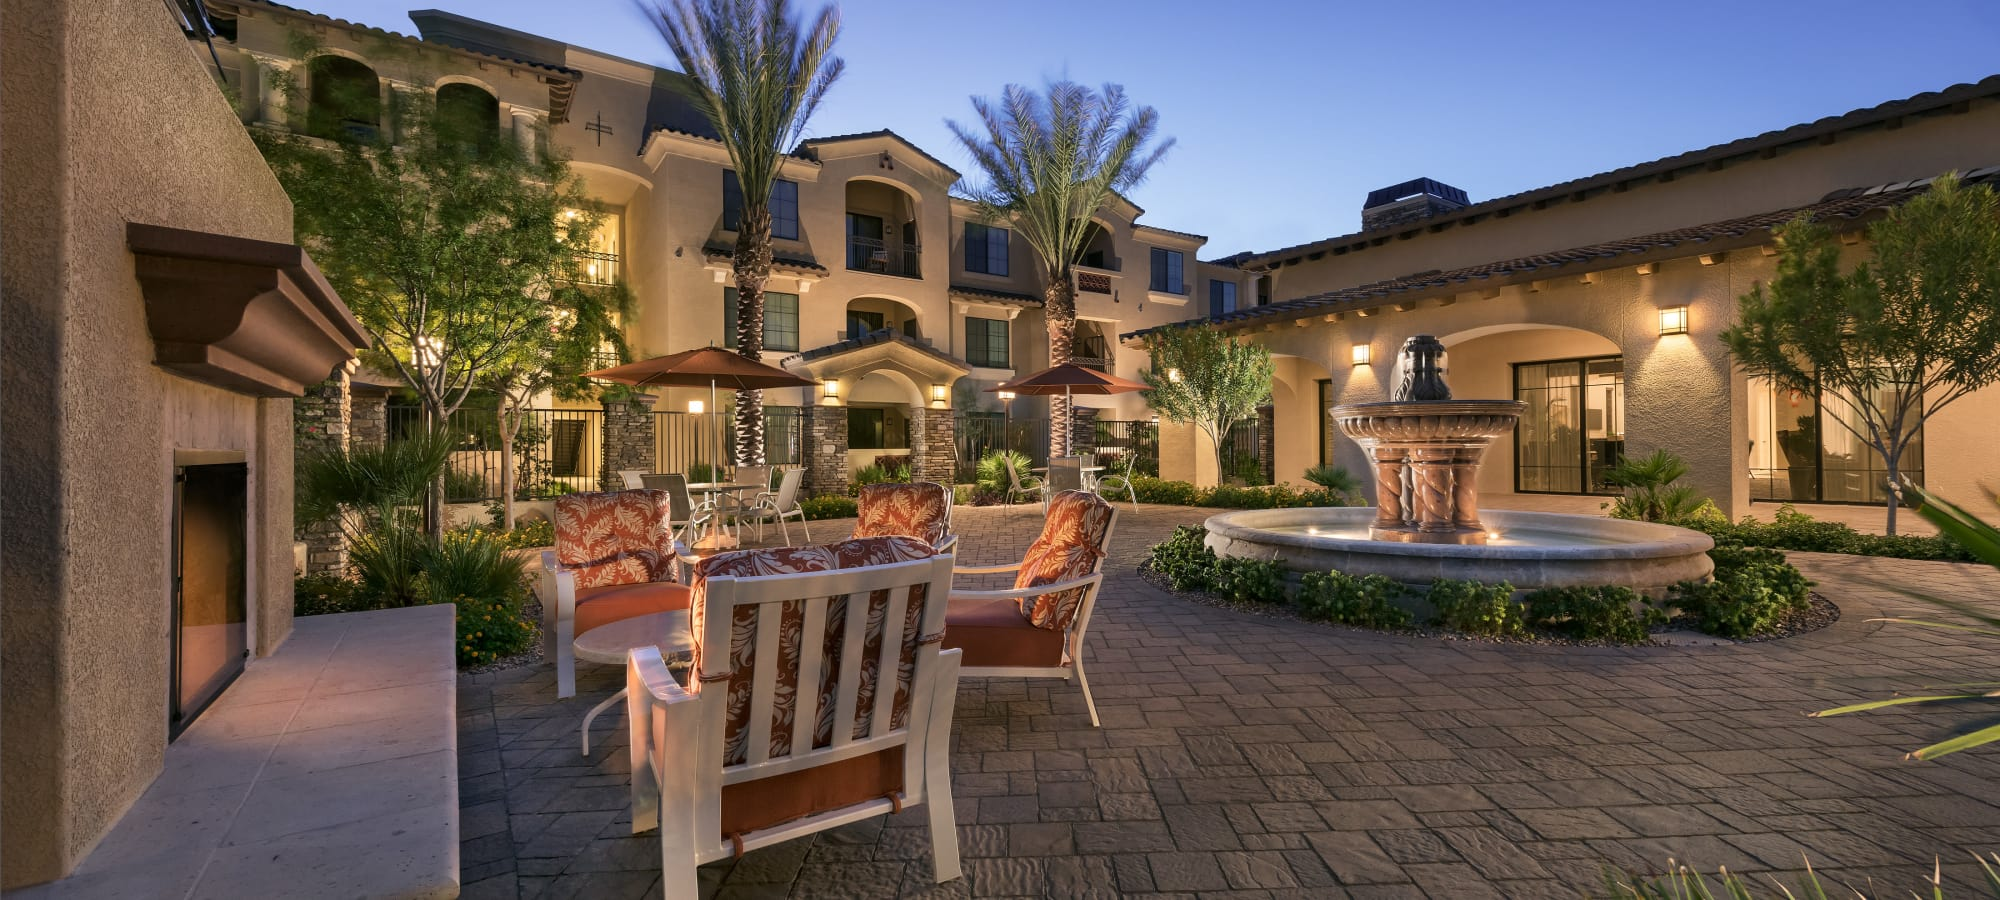 Fountain in the courtyard at San Milan in Phoenix, Arizona